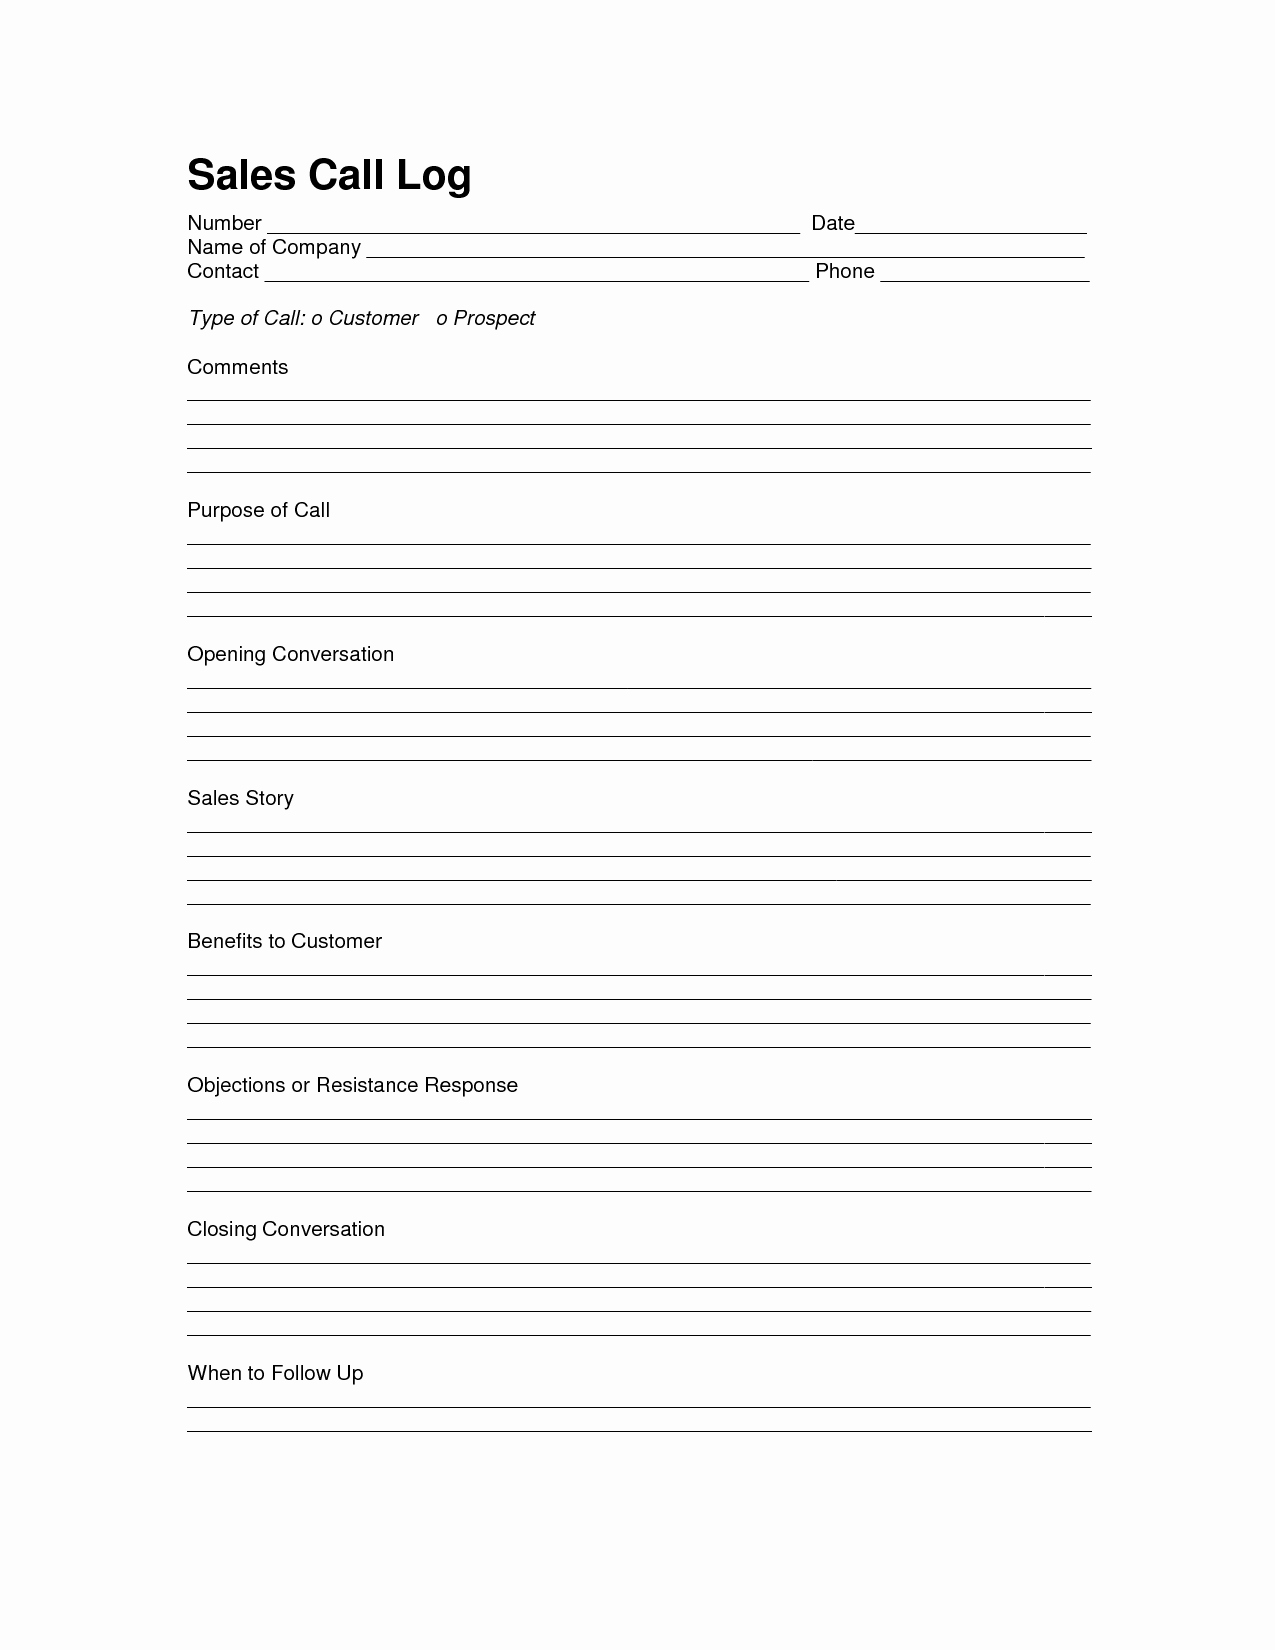 Sales Call Report Template Fresh Sales Log Sheet Template Sales Call Log Template